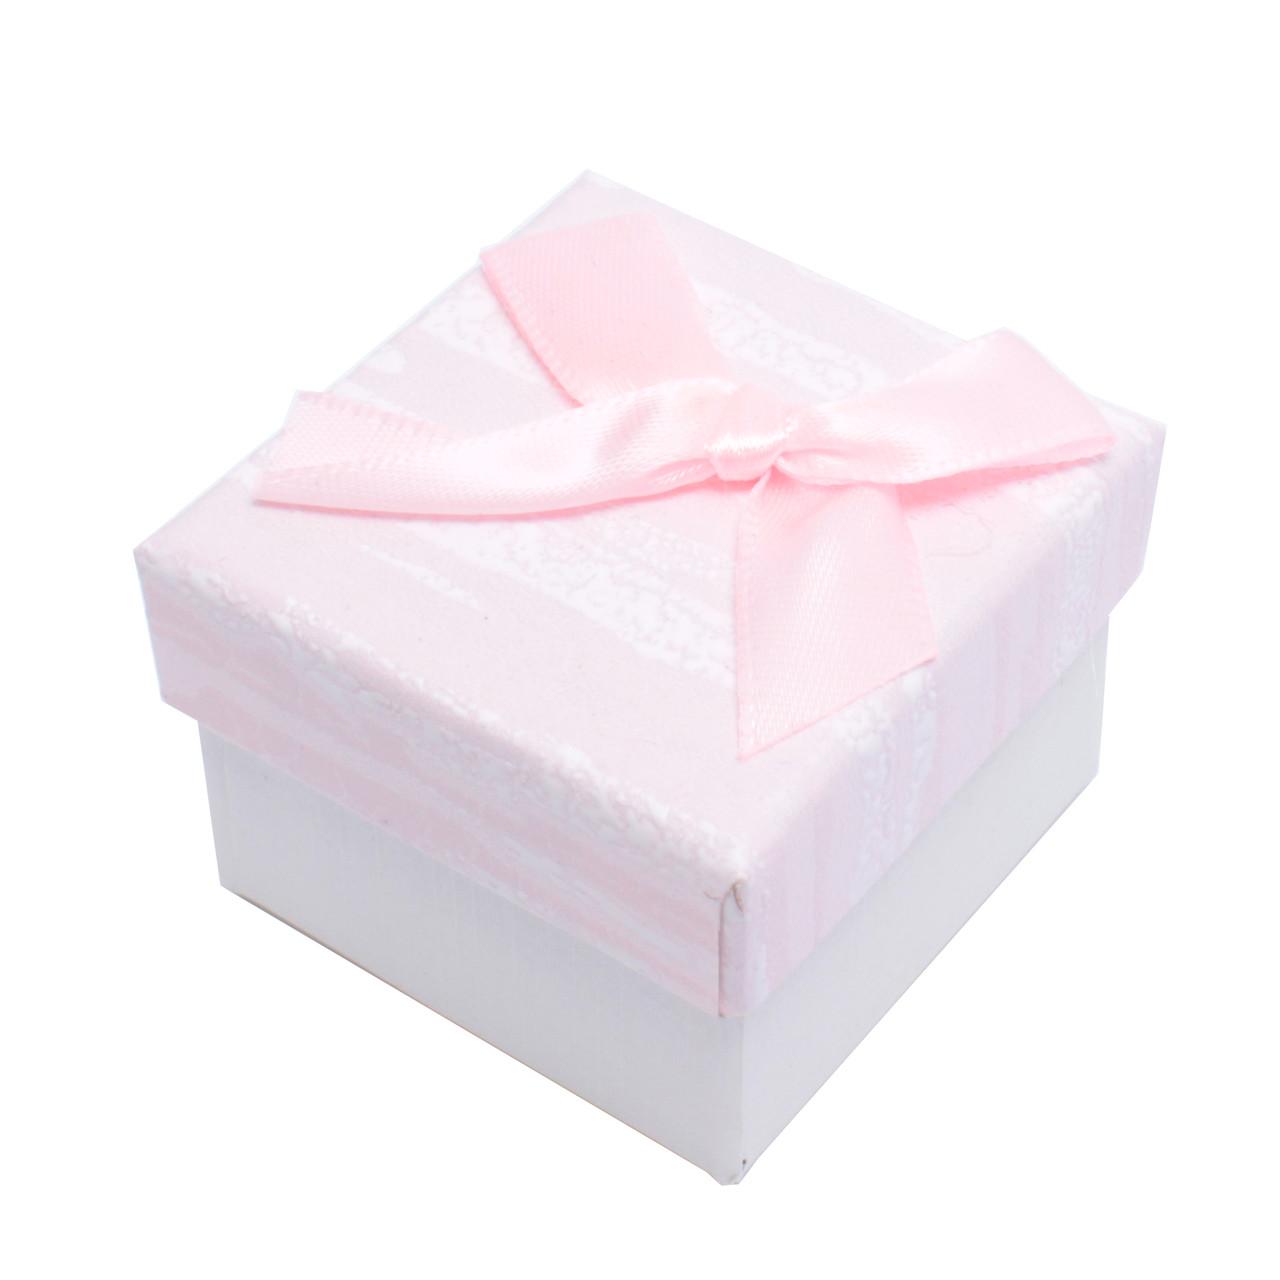 Ювелирная коробочка box1-17